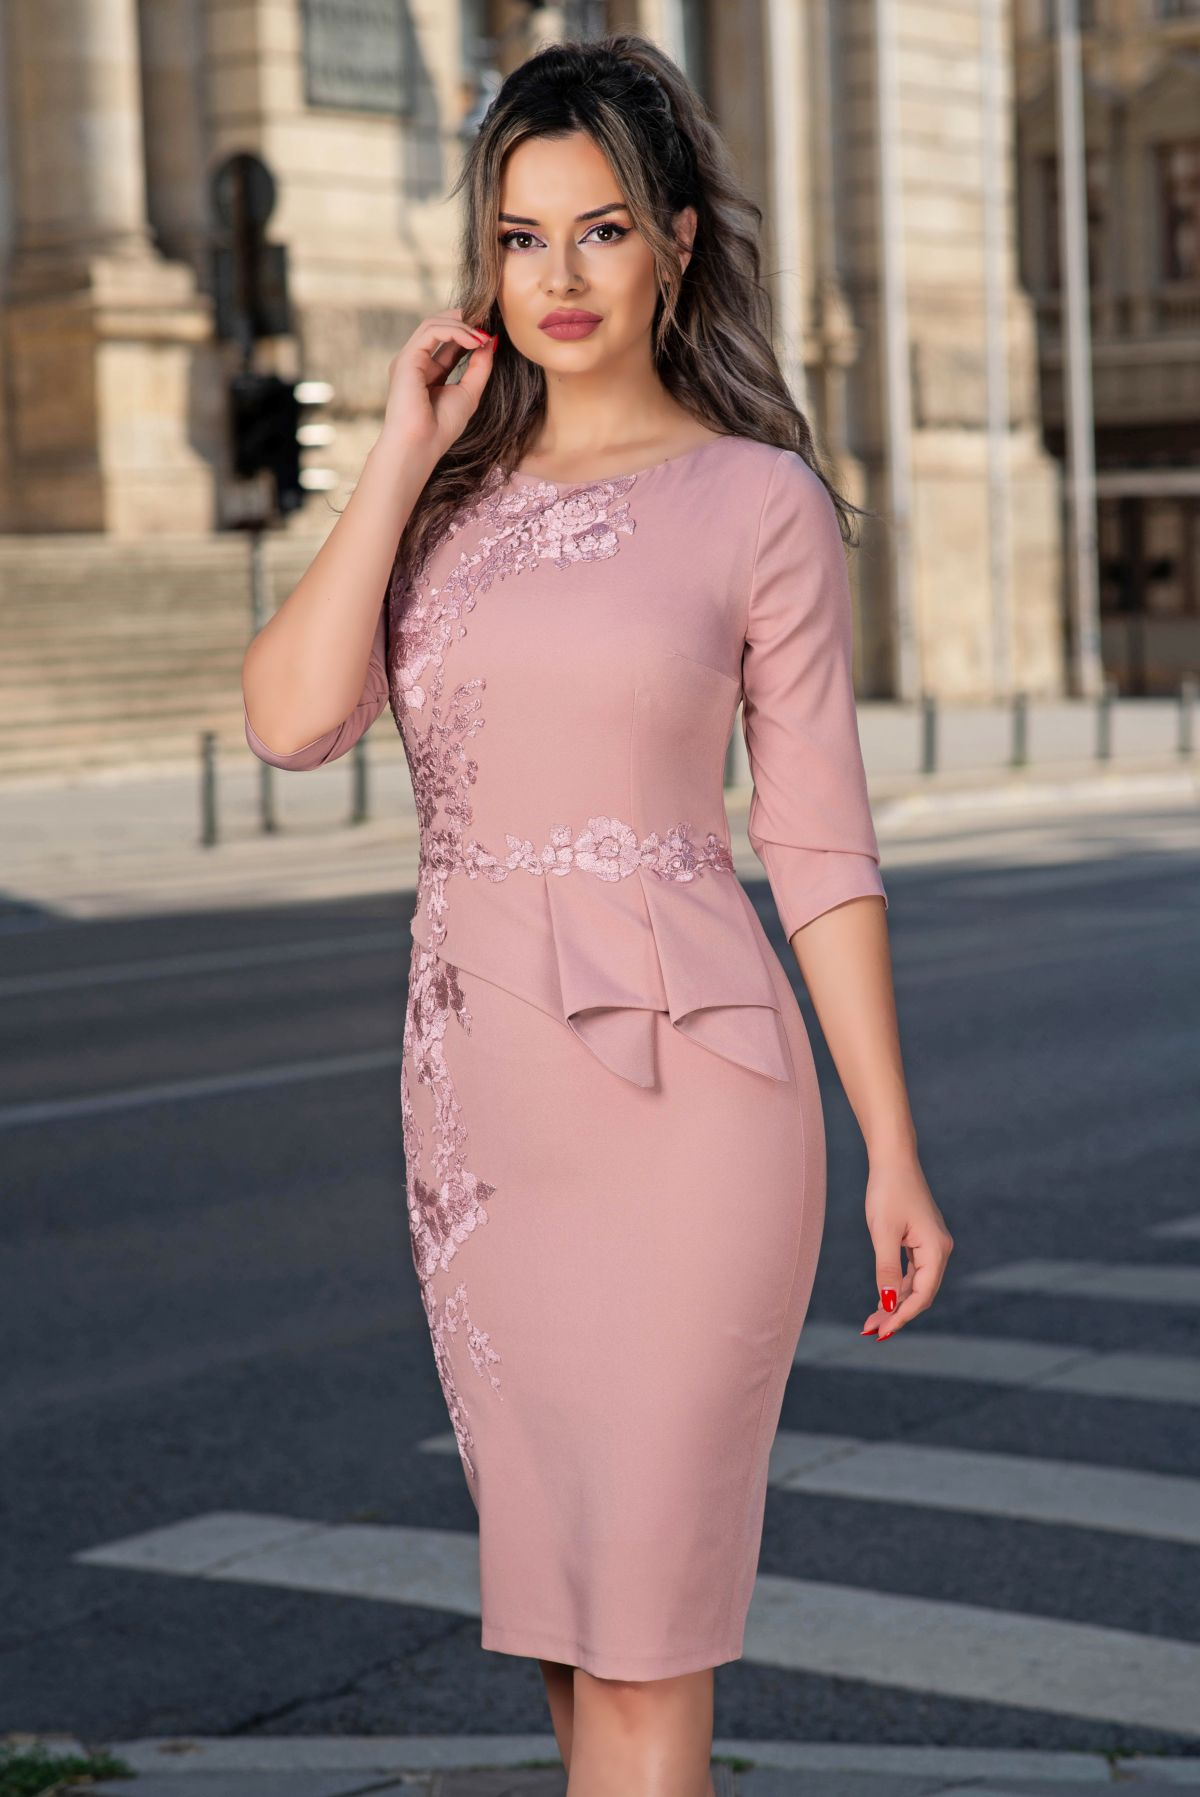 Rochie de ocazie MBG roz pudrat cu broderie si peplum asimetric